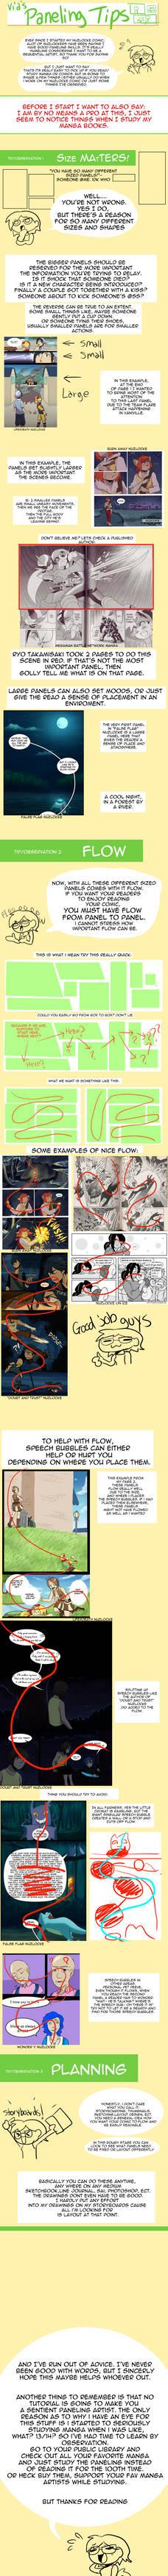 Paneling a Comic Tips